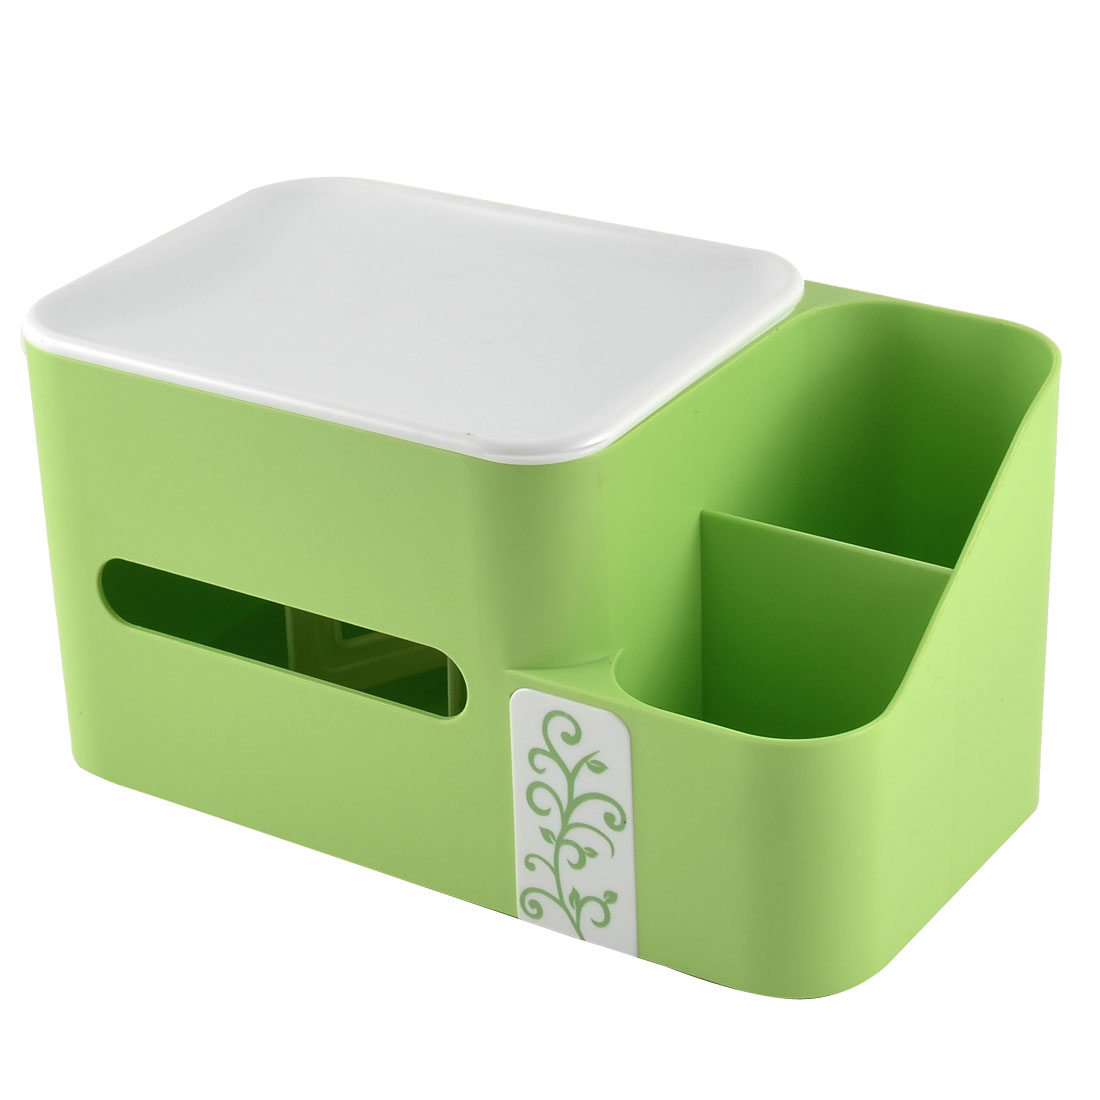 Home Office Desk Plastic Special Spring Design Pen Tissue Holder Green w Storage Box Case